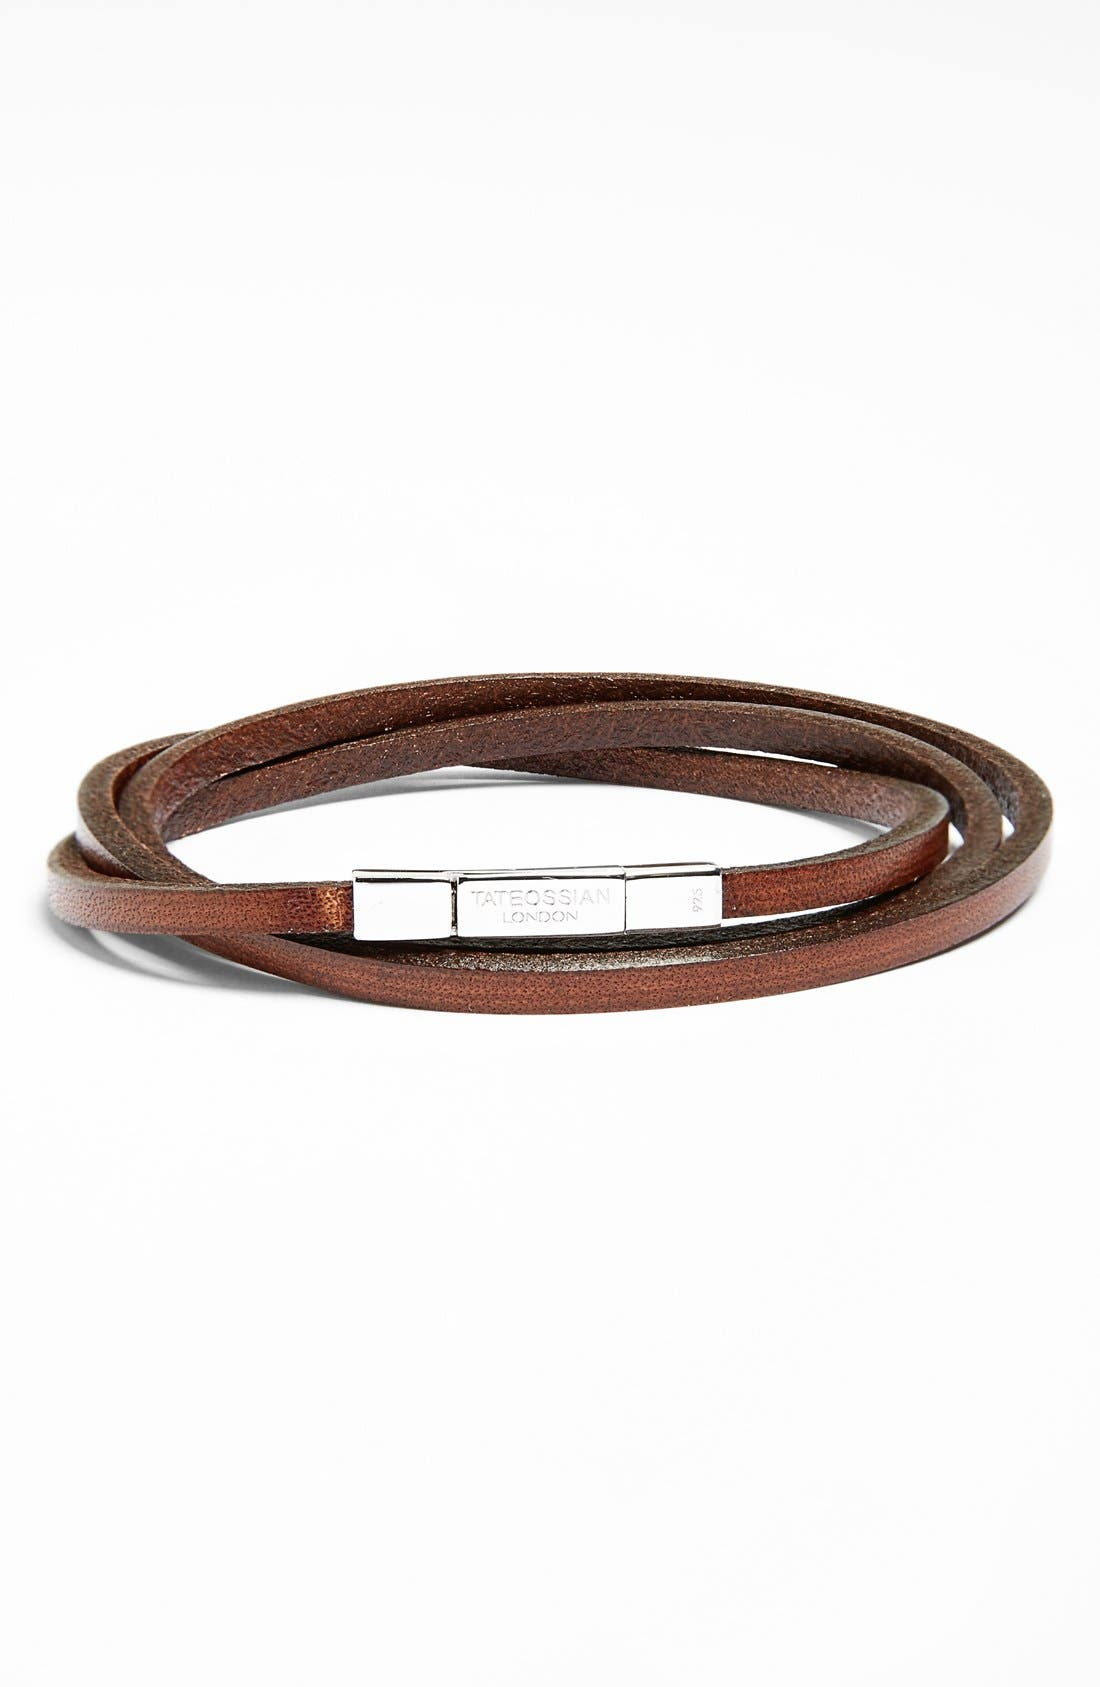 Alternate Image 1 Selected - Tateossian Leather Wrap Bracelet